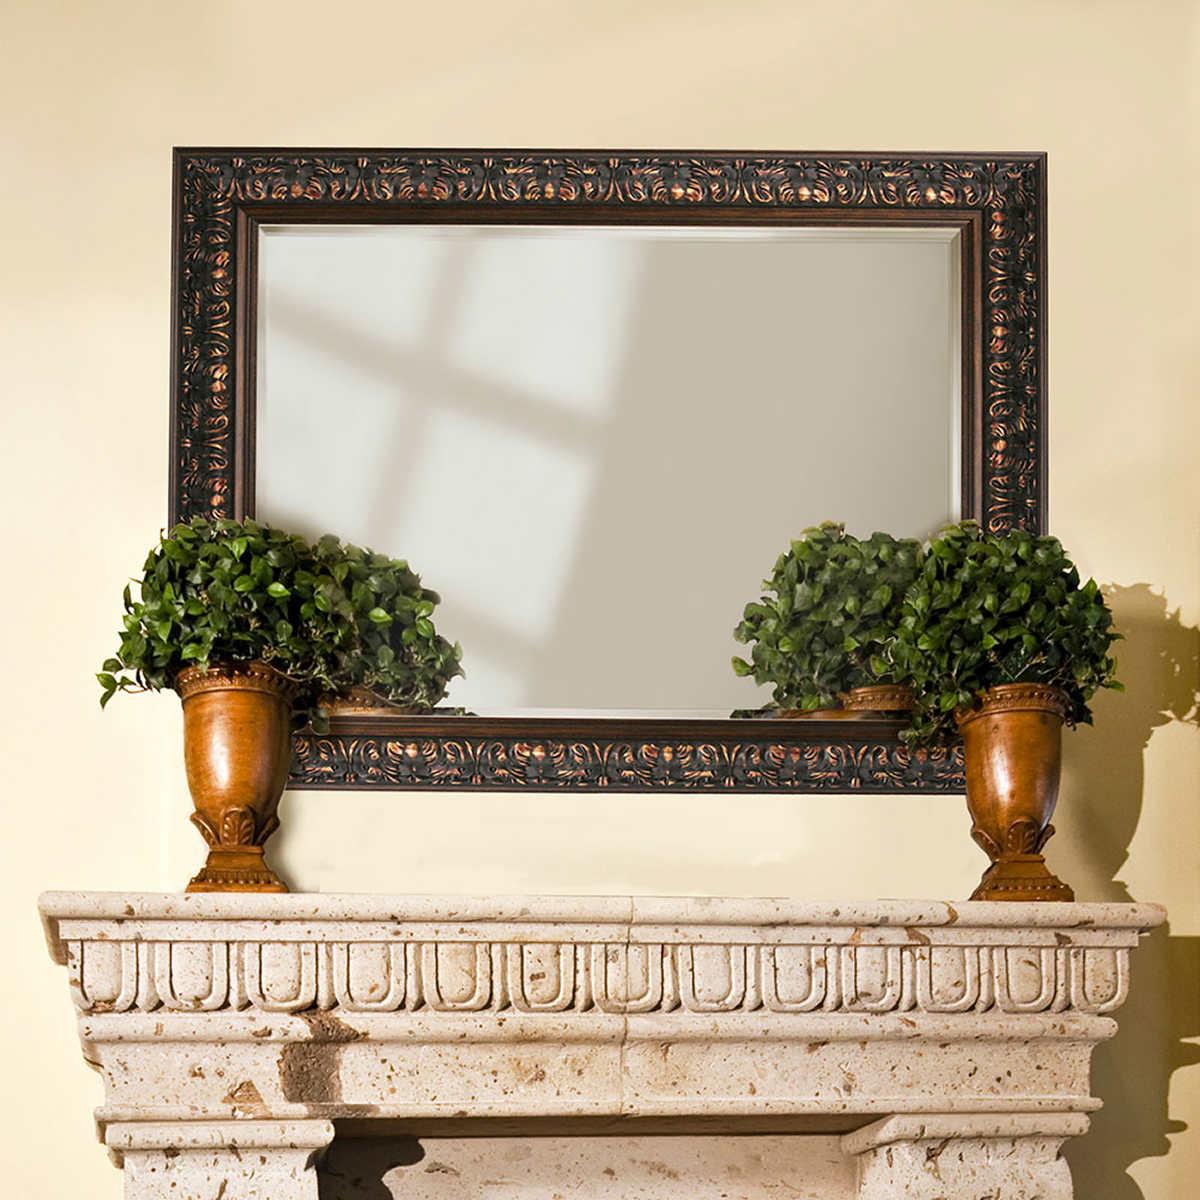 This italian circular wooden wall mirror is no longer available - Athena Mirror